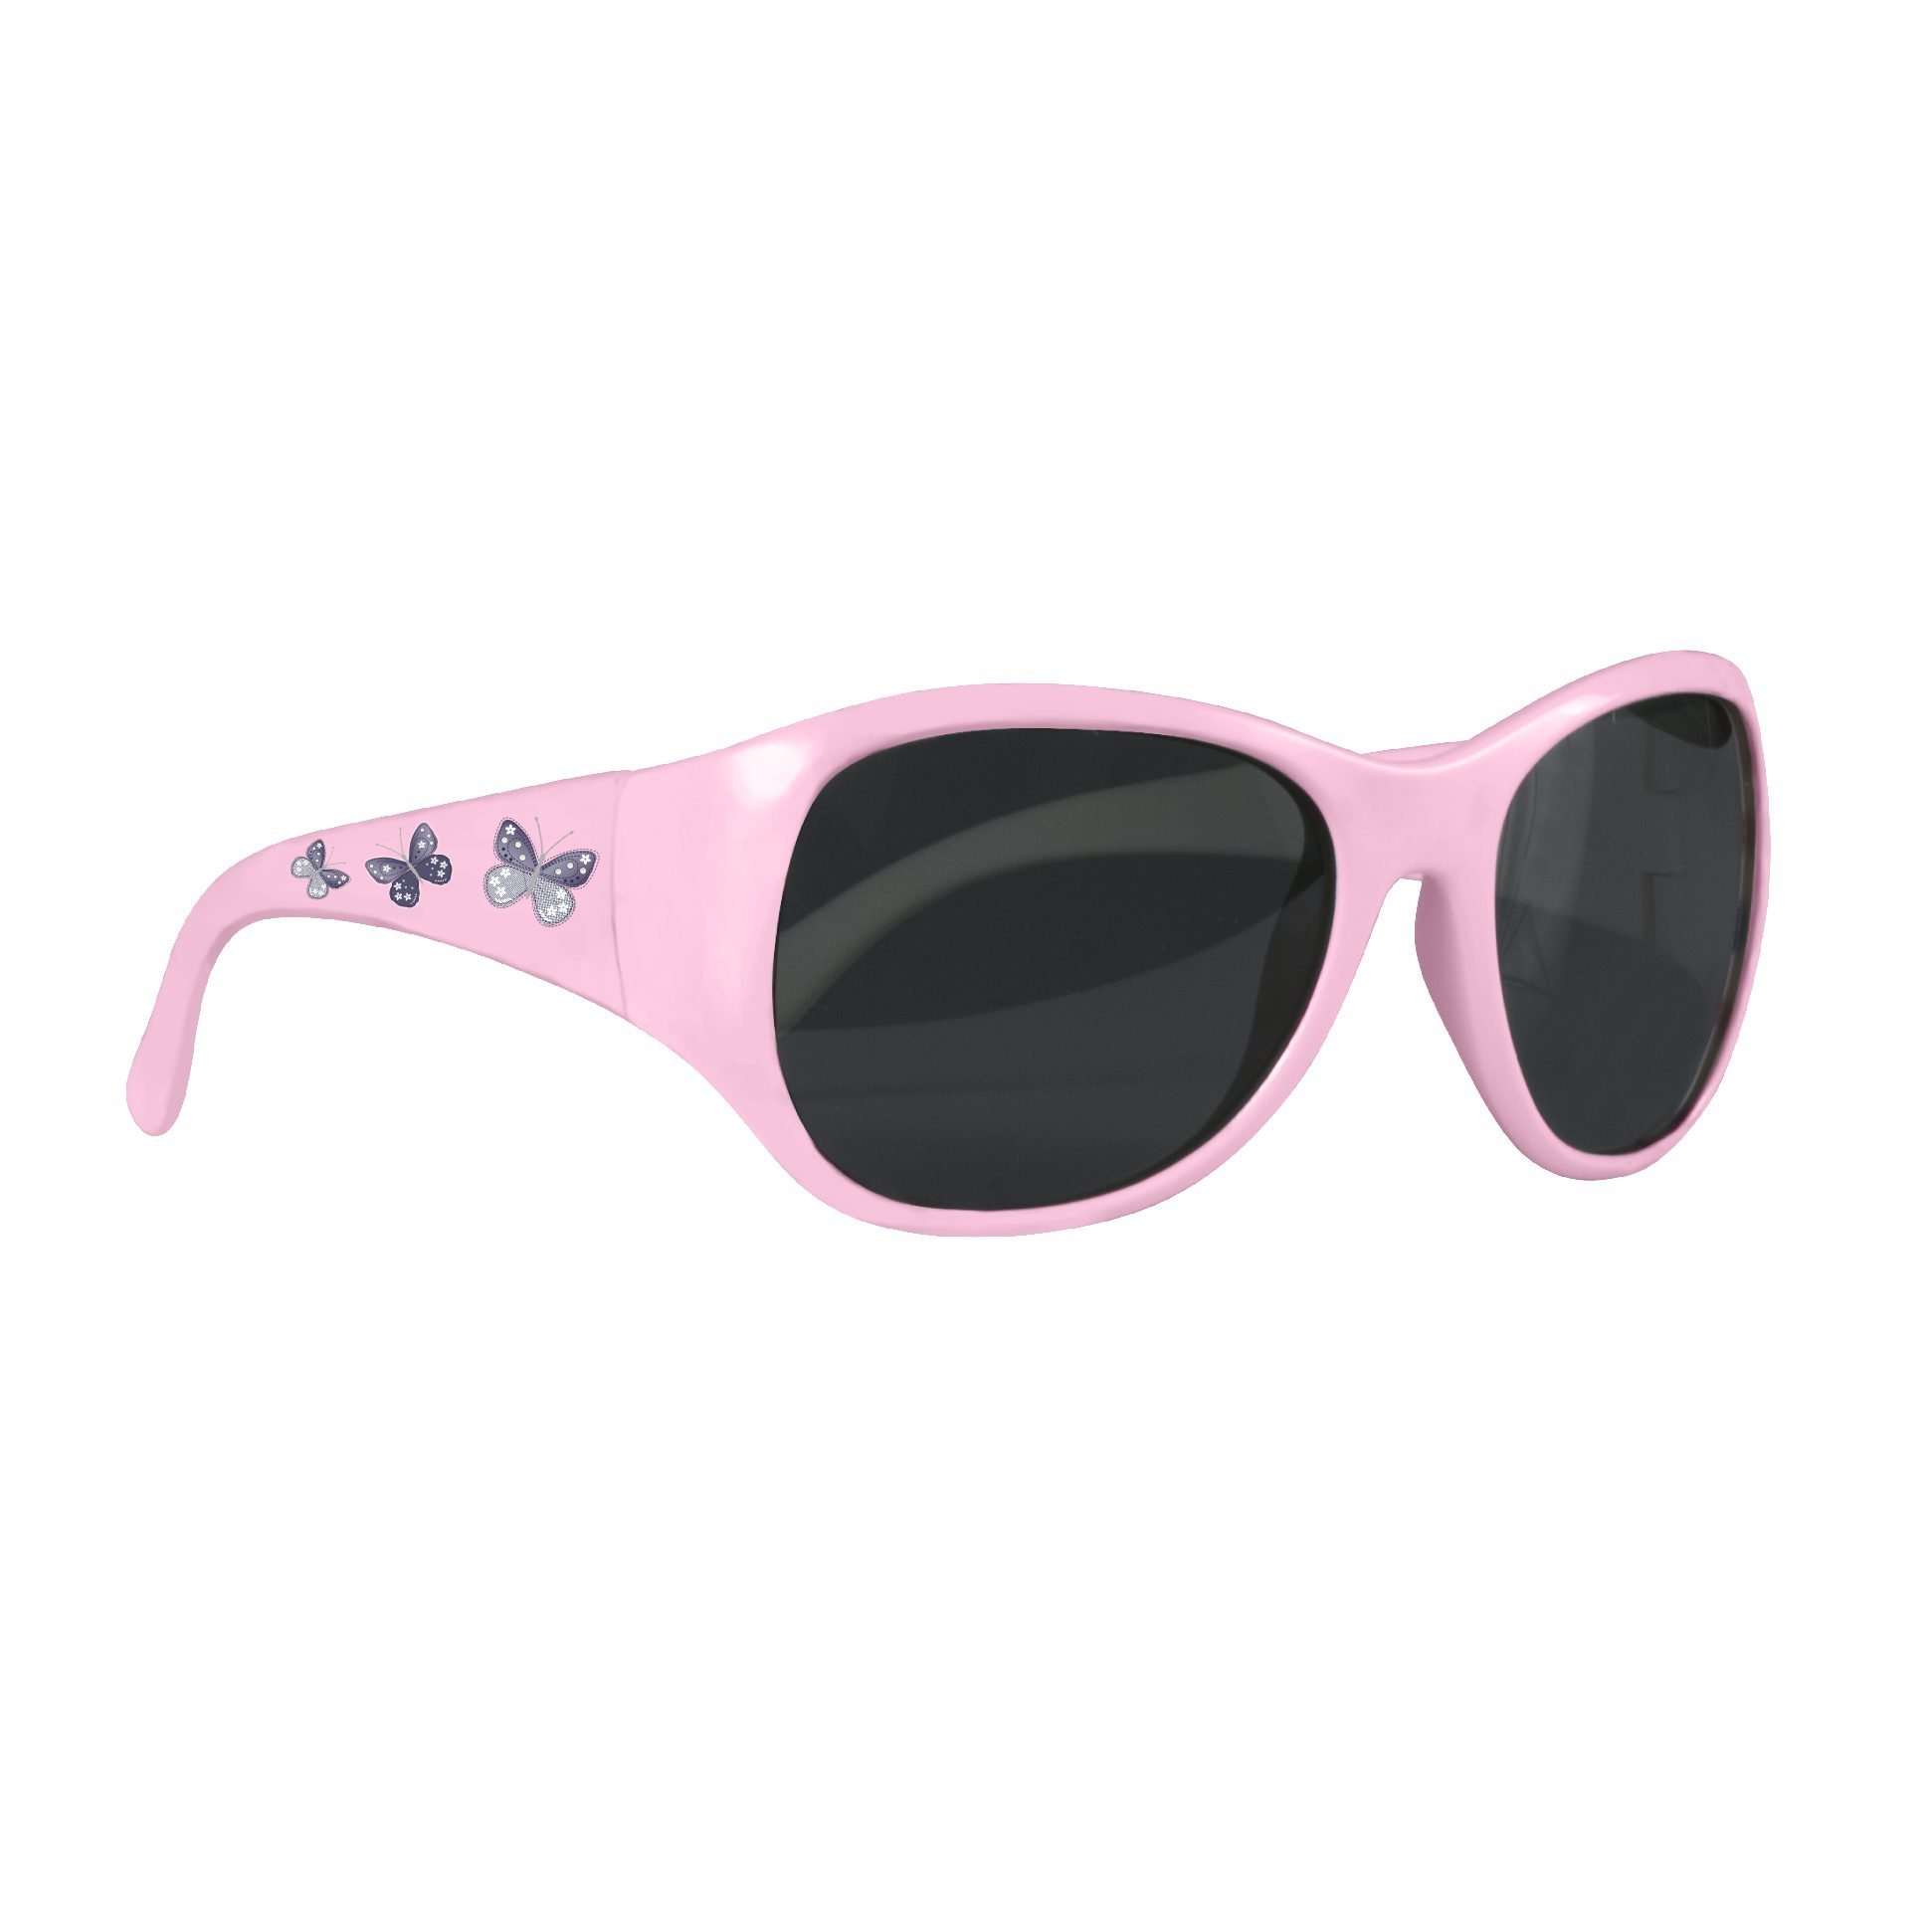 Chicco Gea brýle dívčí 24m+